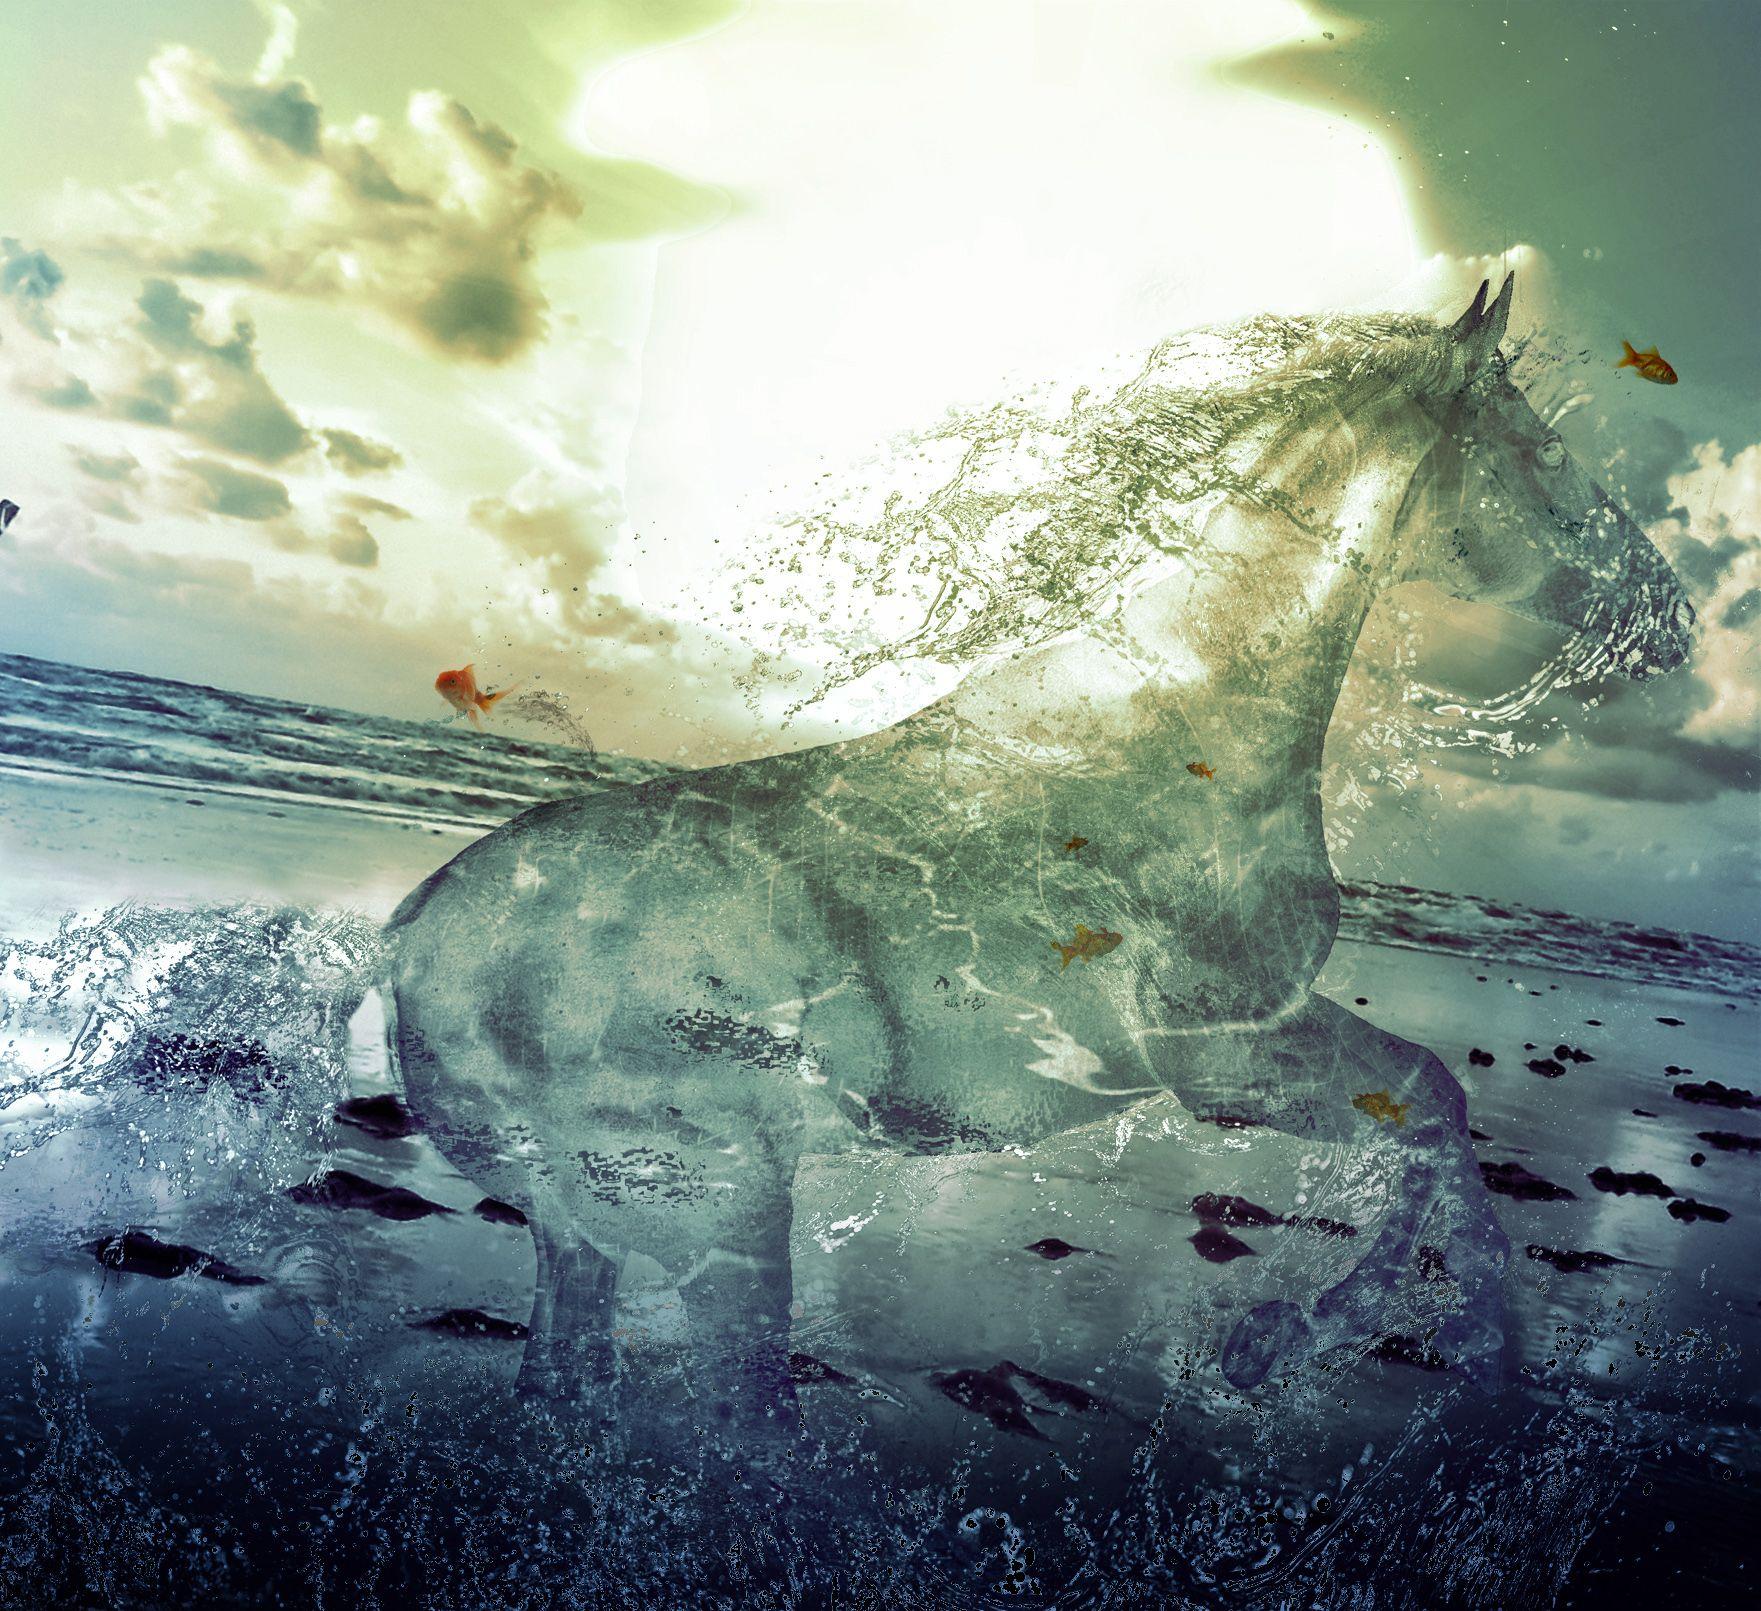 Equine Horse Art Ceramic Accent Tile 8 x 8 Kitchen Shower Backsplash Shadow Dancer by Kim McElroy